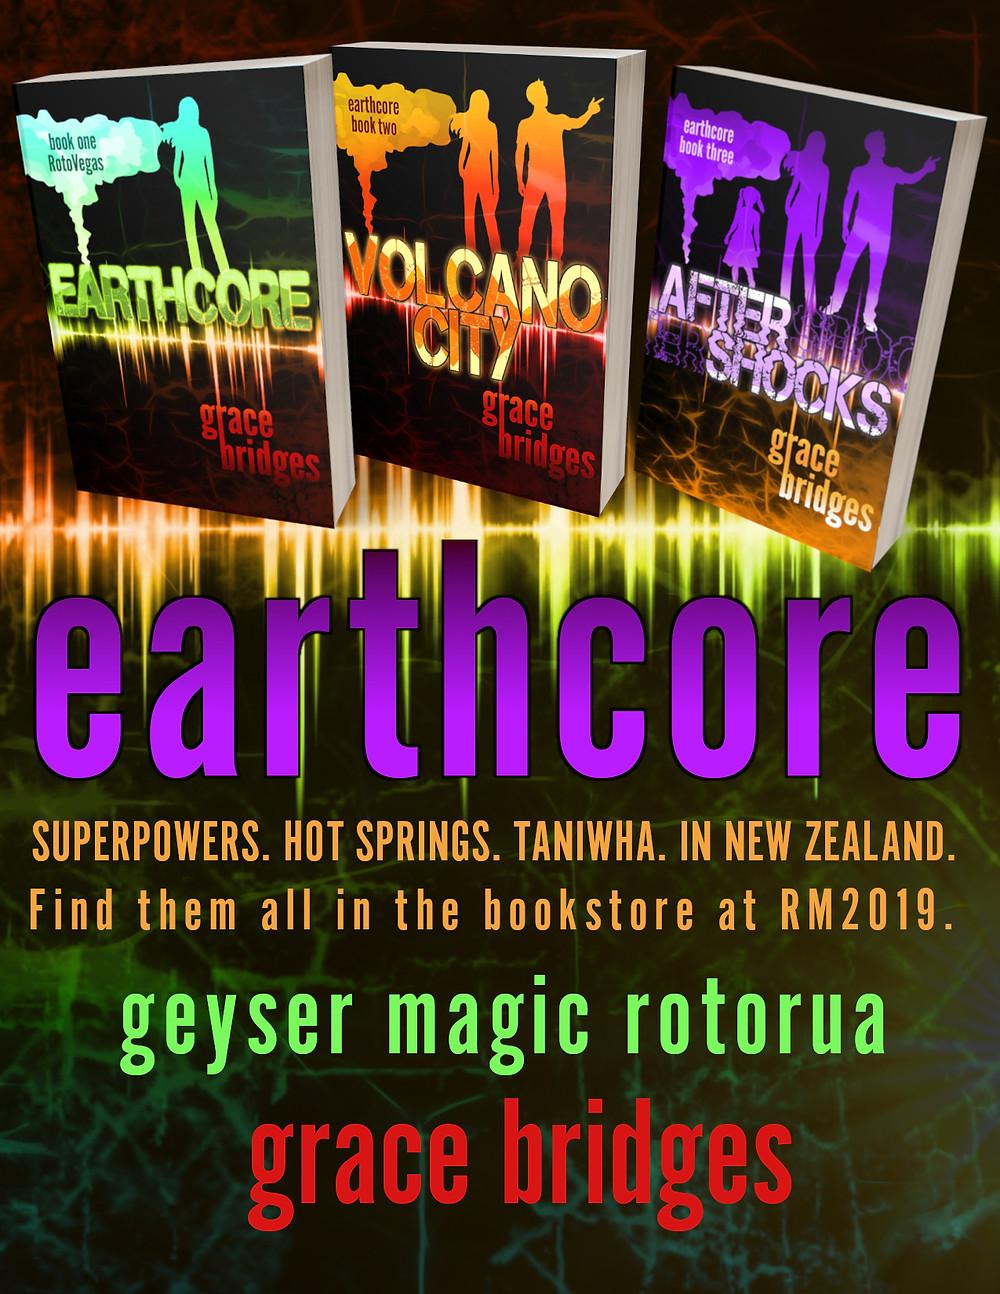 Earthcore trilogy covers by Grace Bridges